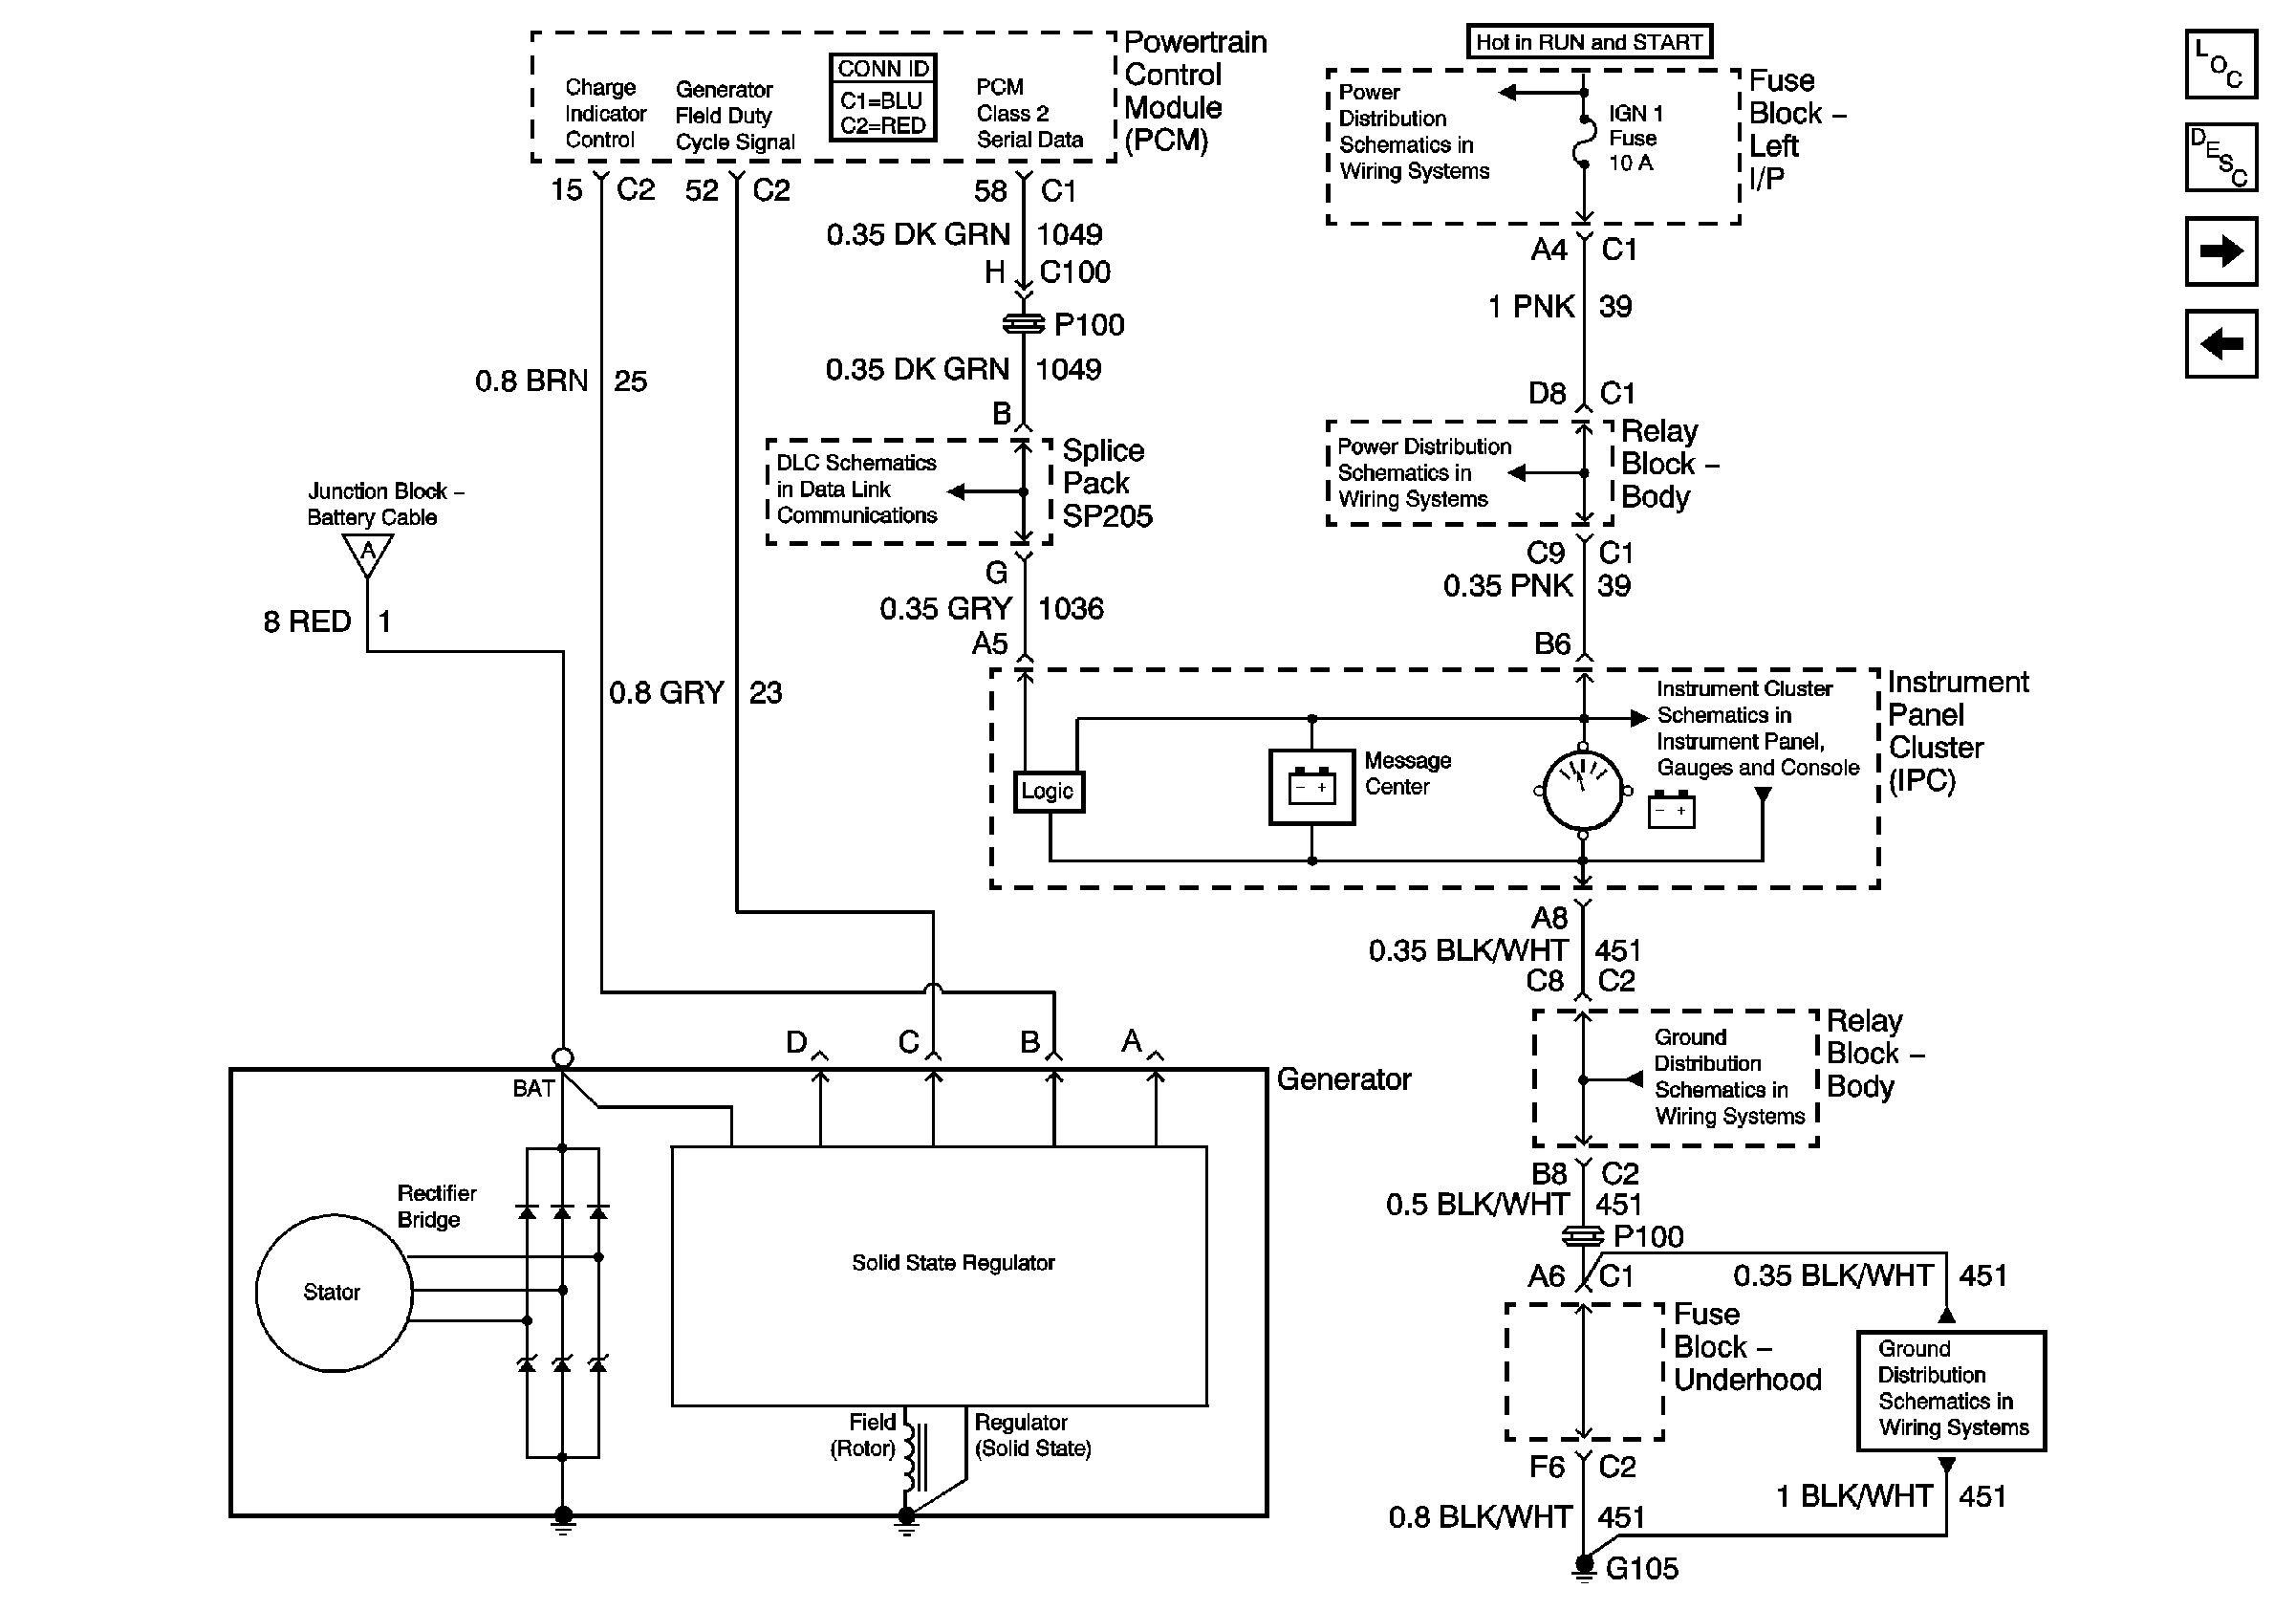 Chevy Alternator Wiring Diagram In 2020 Electrical Wiring Diagram Alternator Diagram